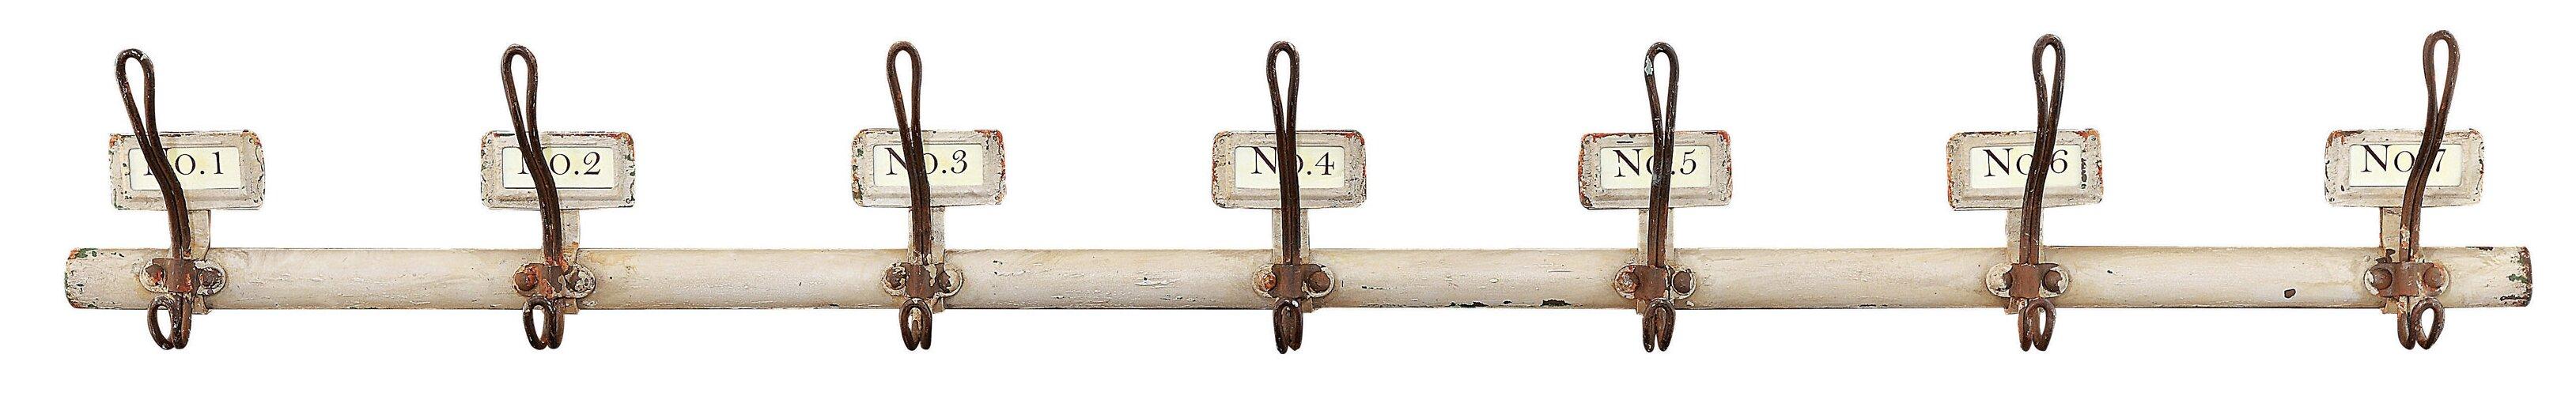 Coat Hooks rustic numbered coat hooks & reviews | birch lane